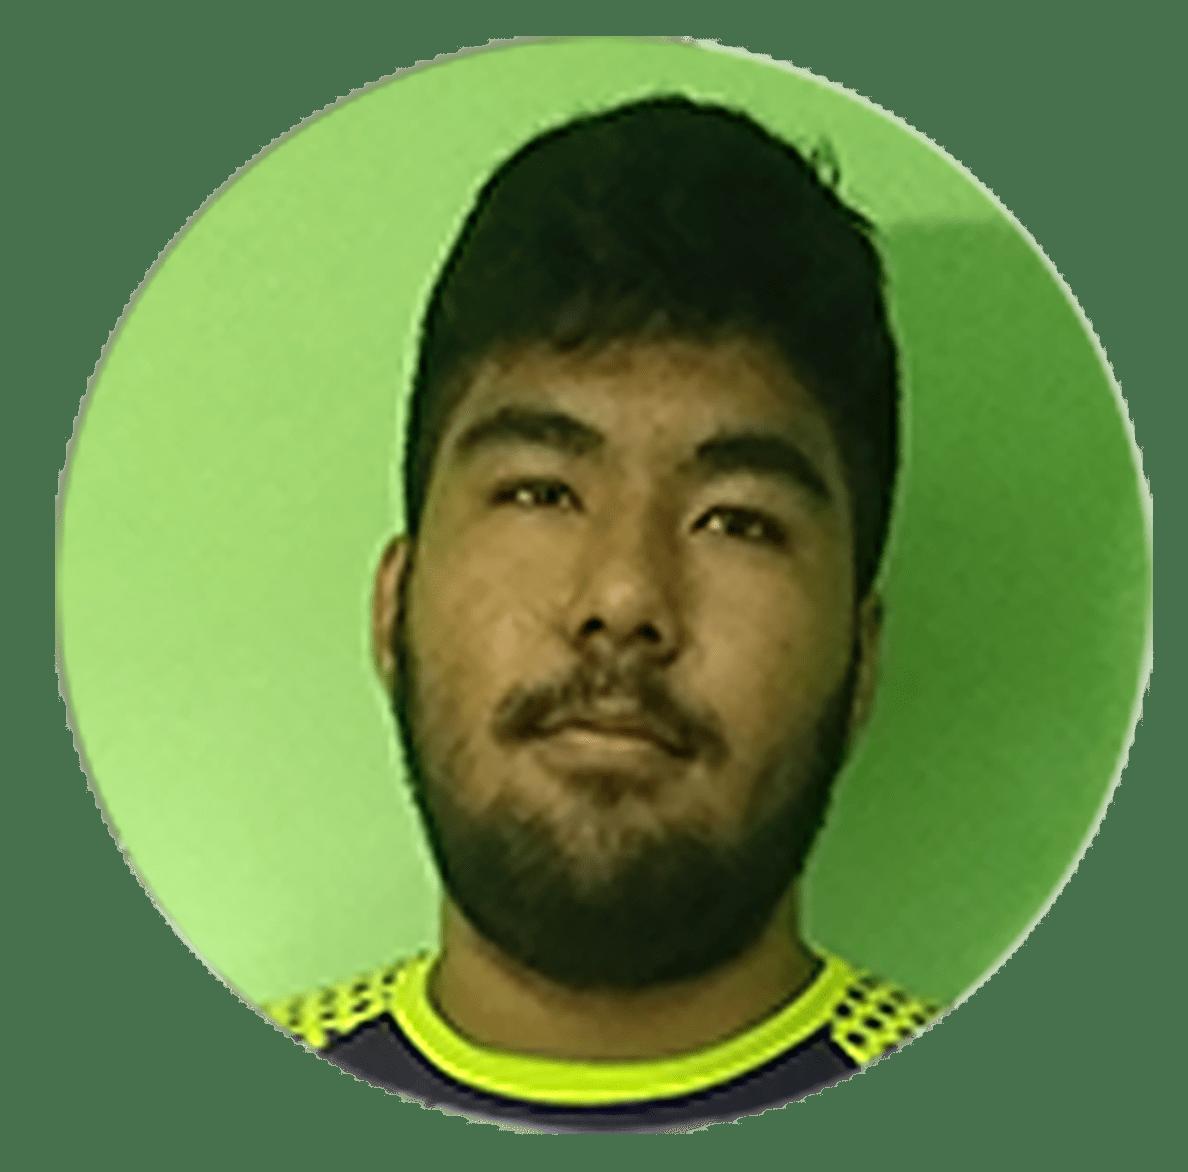 Jhonny Hideki Manjome - Sorocaba